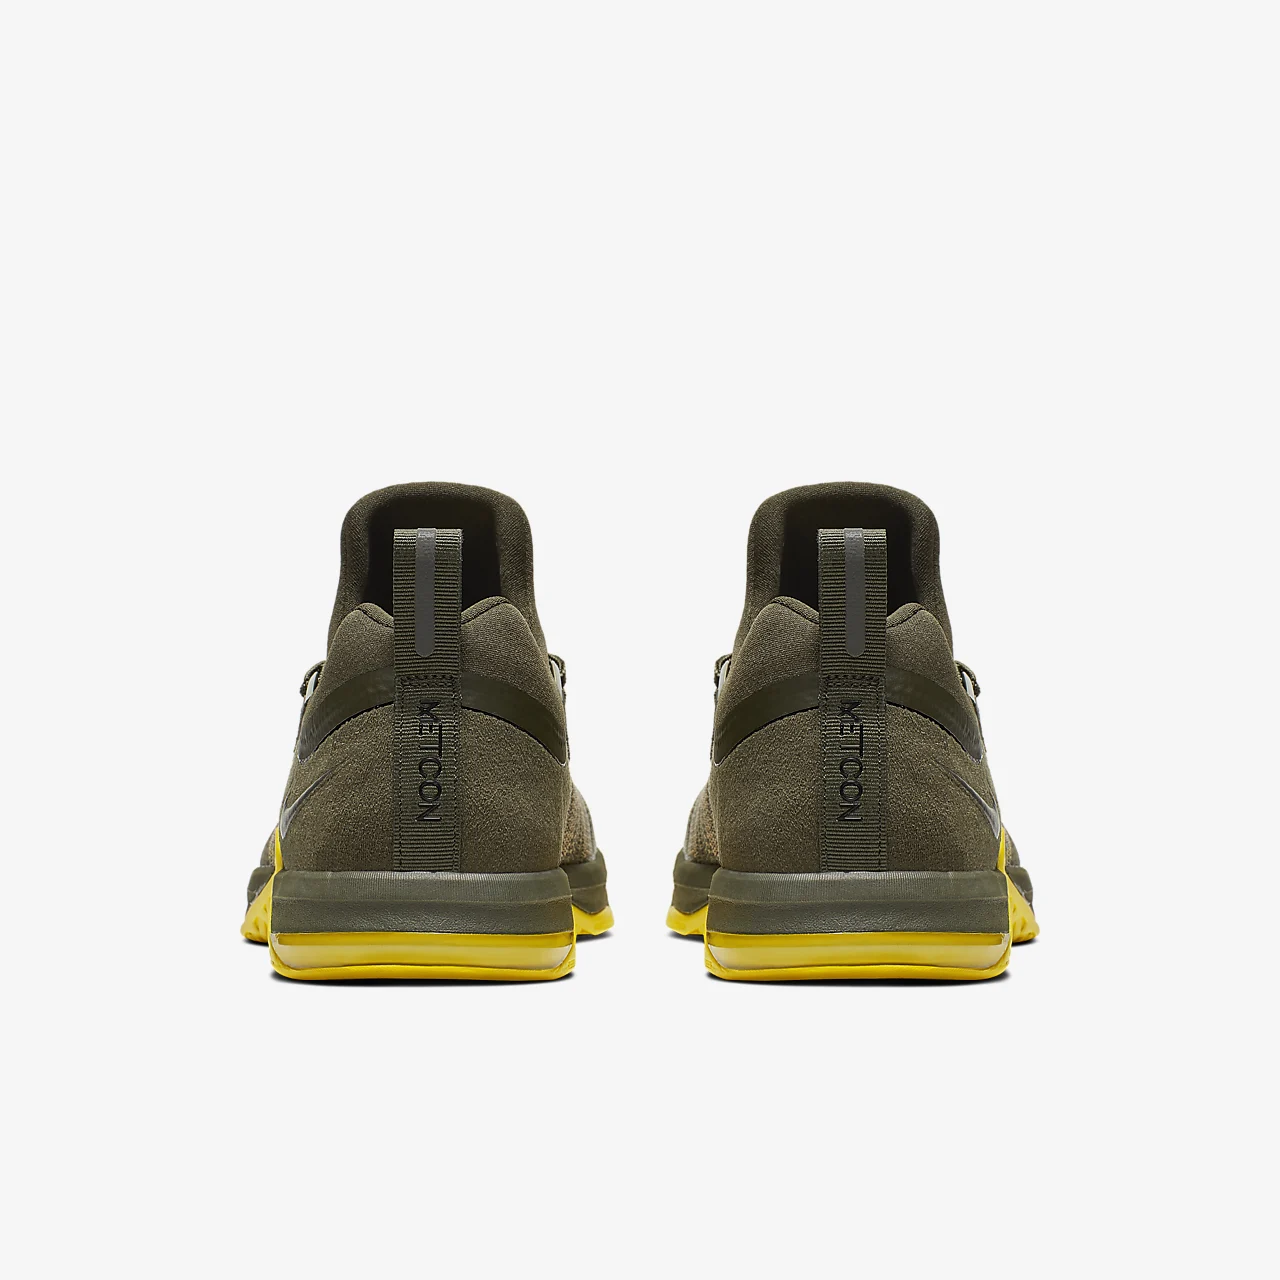 Nike Metcon Flyknit 3 Men's Cross Training/Weightlifting Shoe AQ8022-300